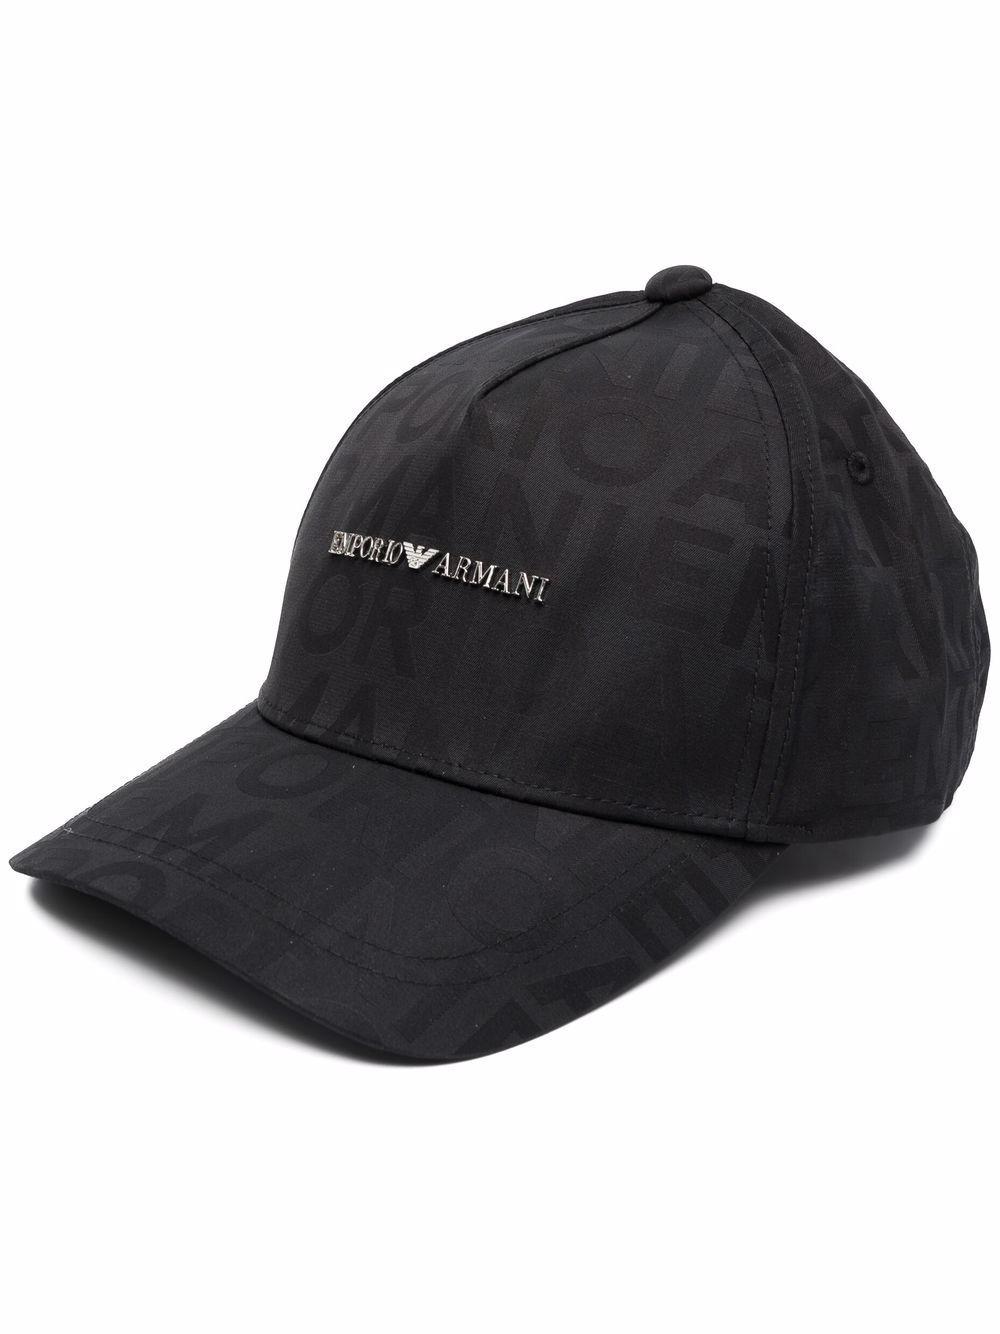 Cappello con logo